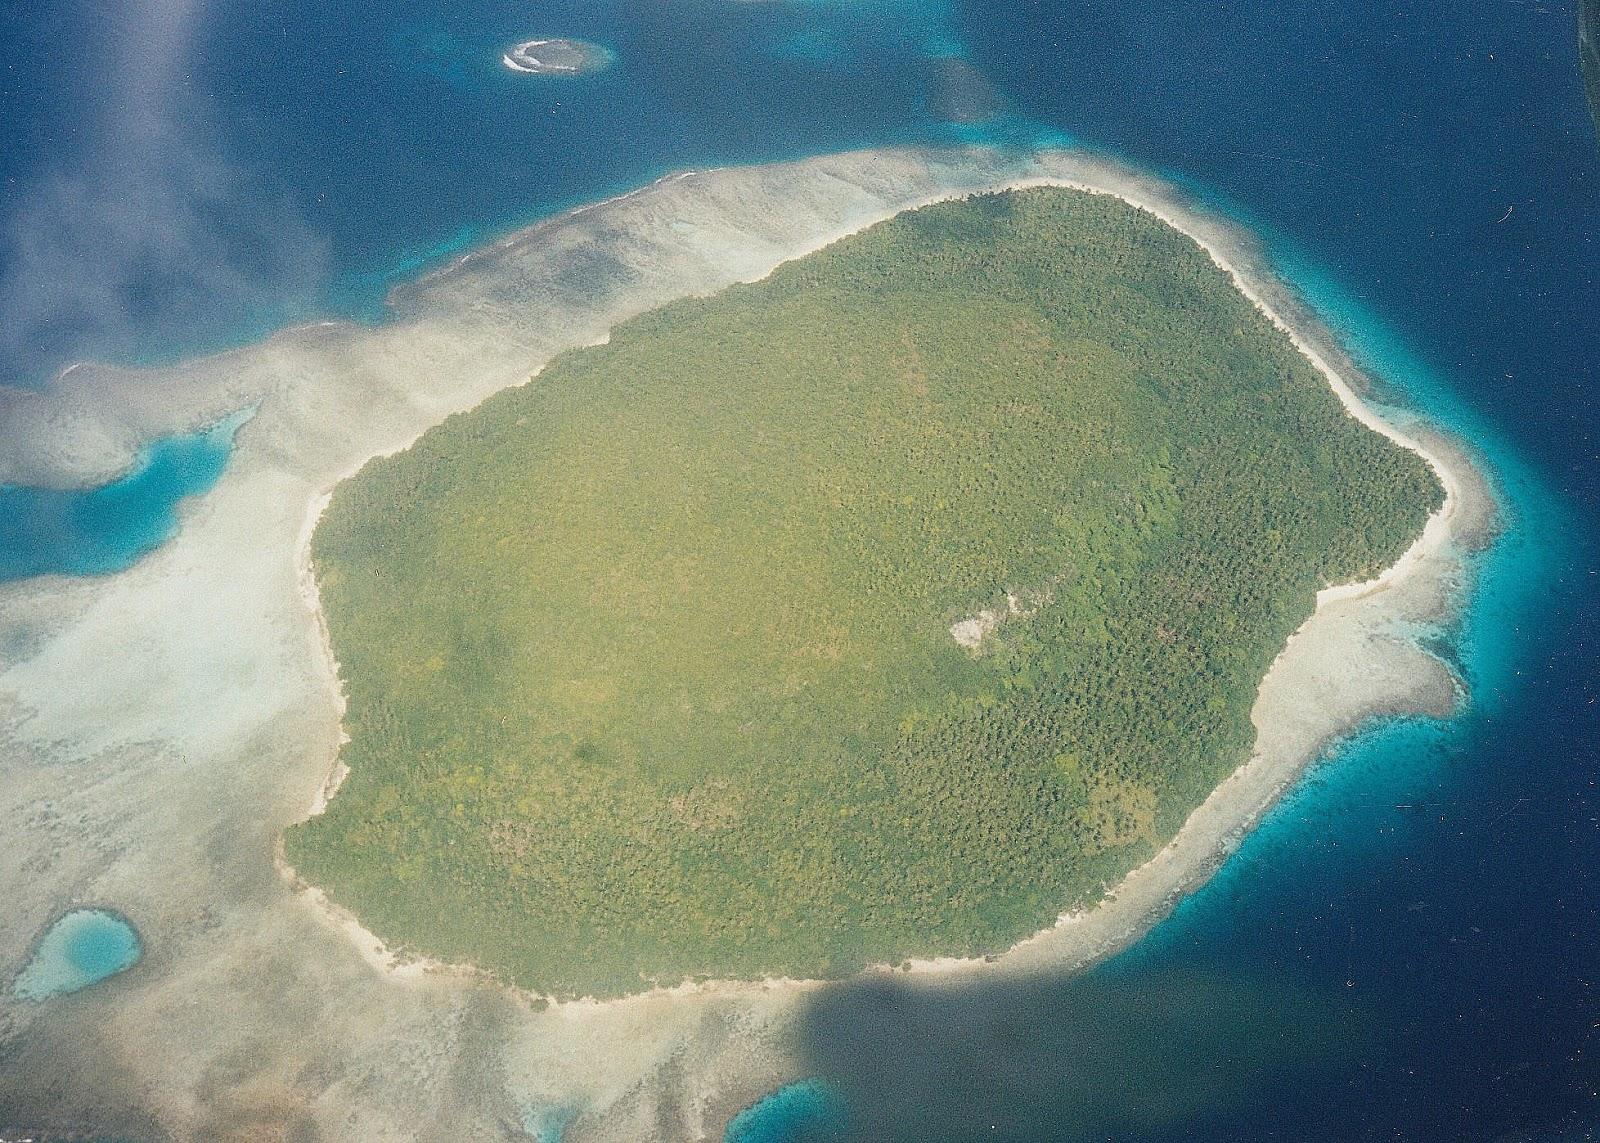 Tonga travel involves some beautiful island scenery